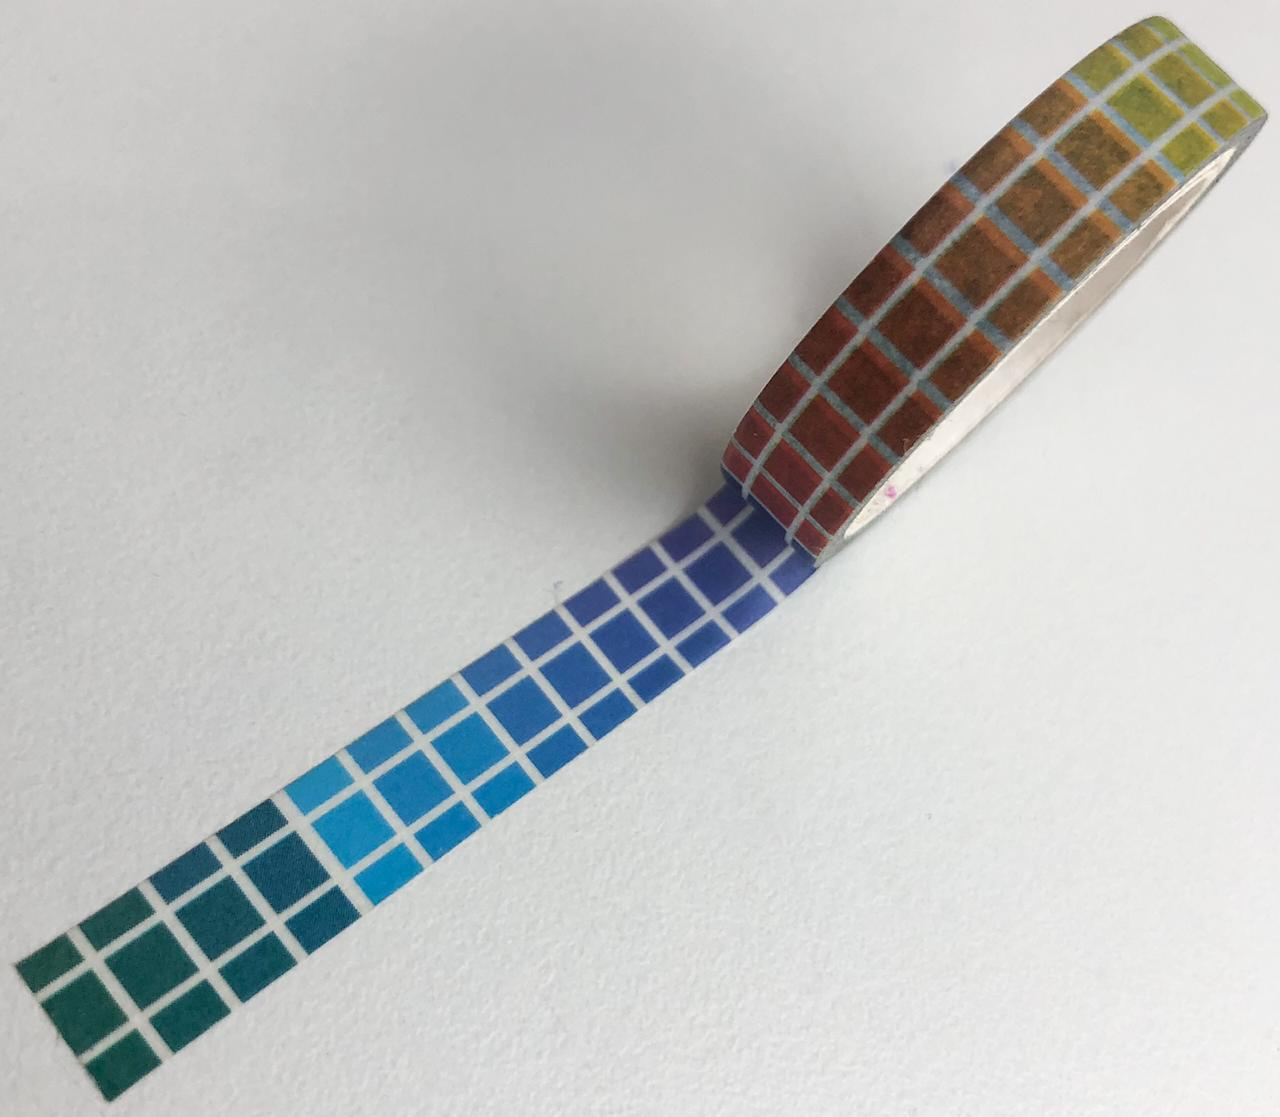 Washi Tape Ladrilhos coloridos (washi57)